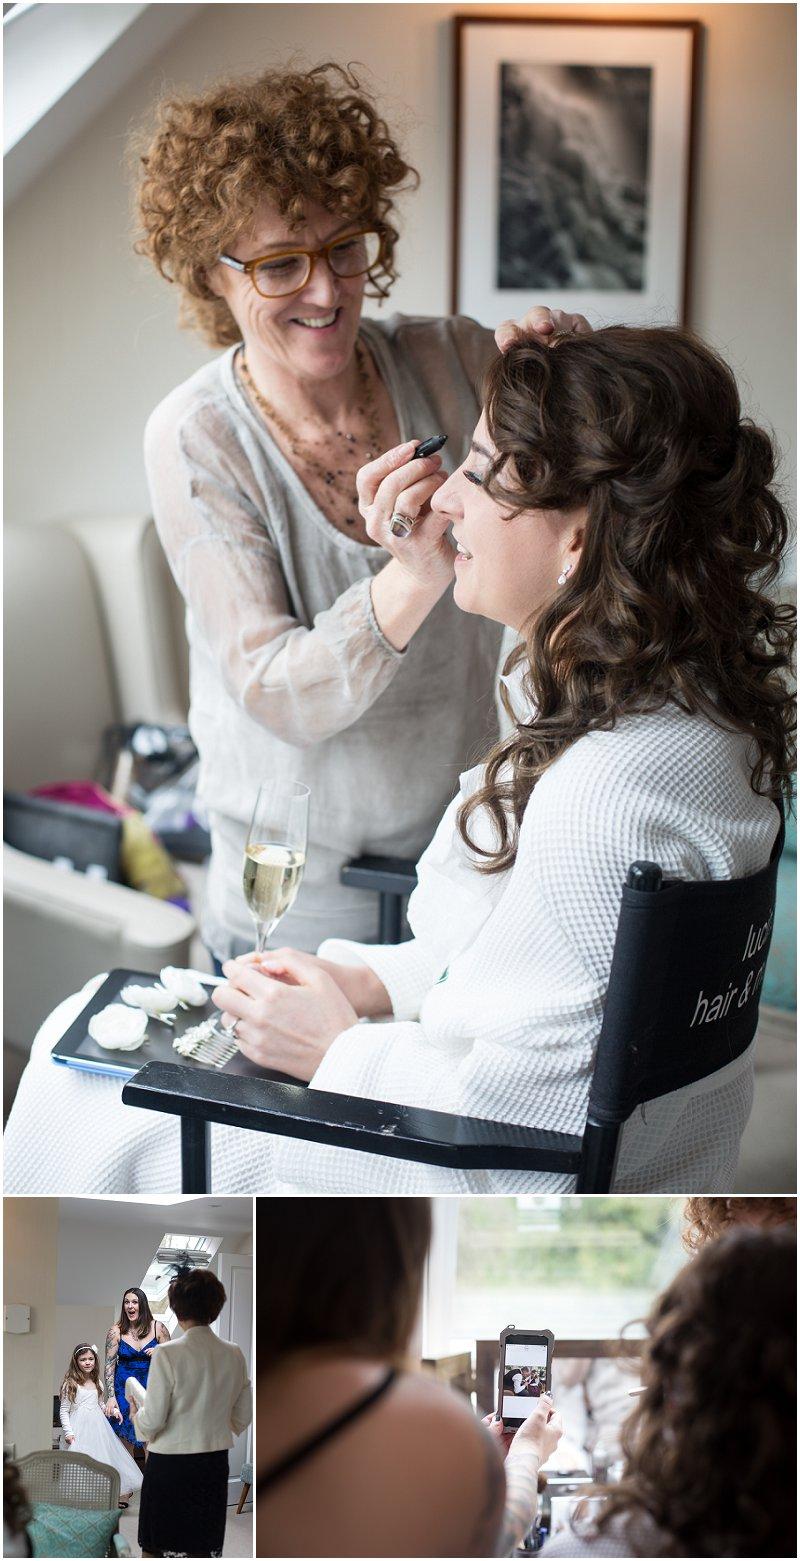 Lucinda Cumbria Makeup and Hair artist